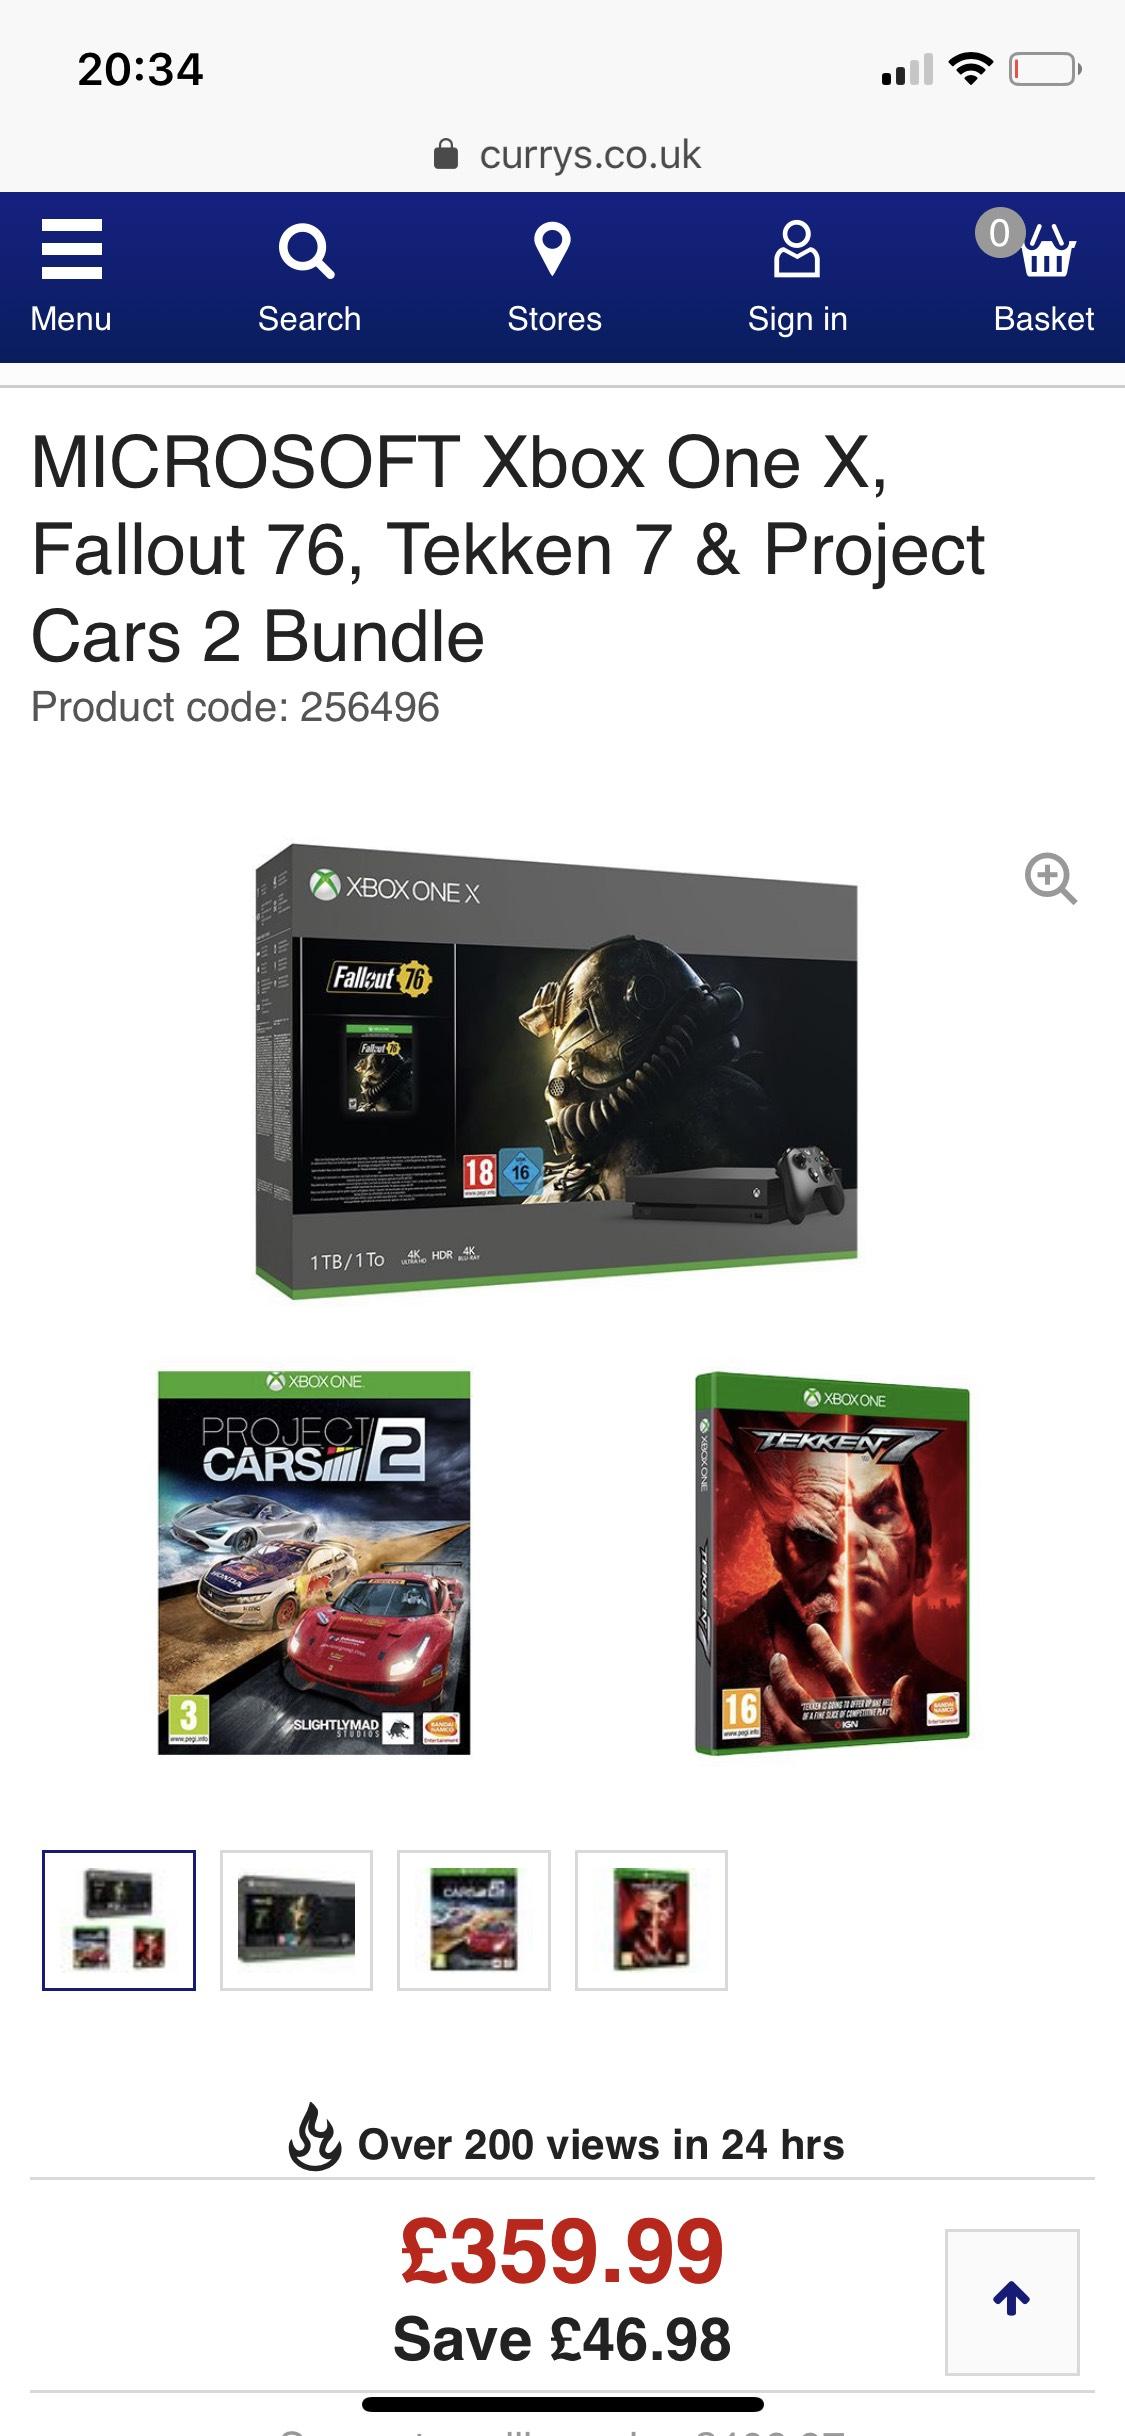 Xbox one x fallout 76 bundle - £359.99 @ Currys